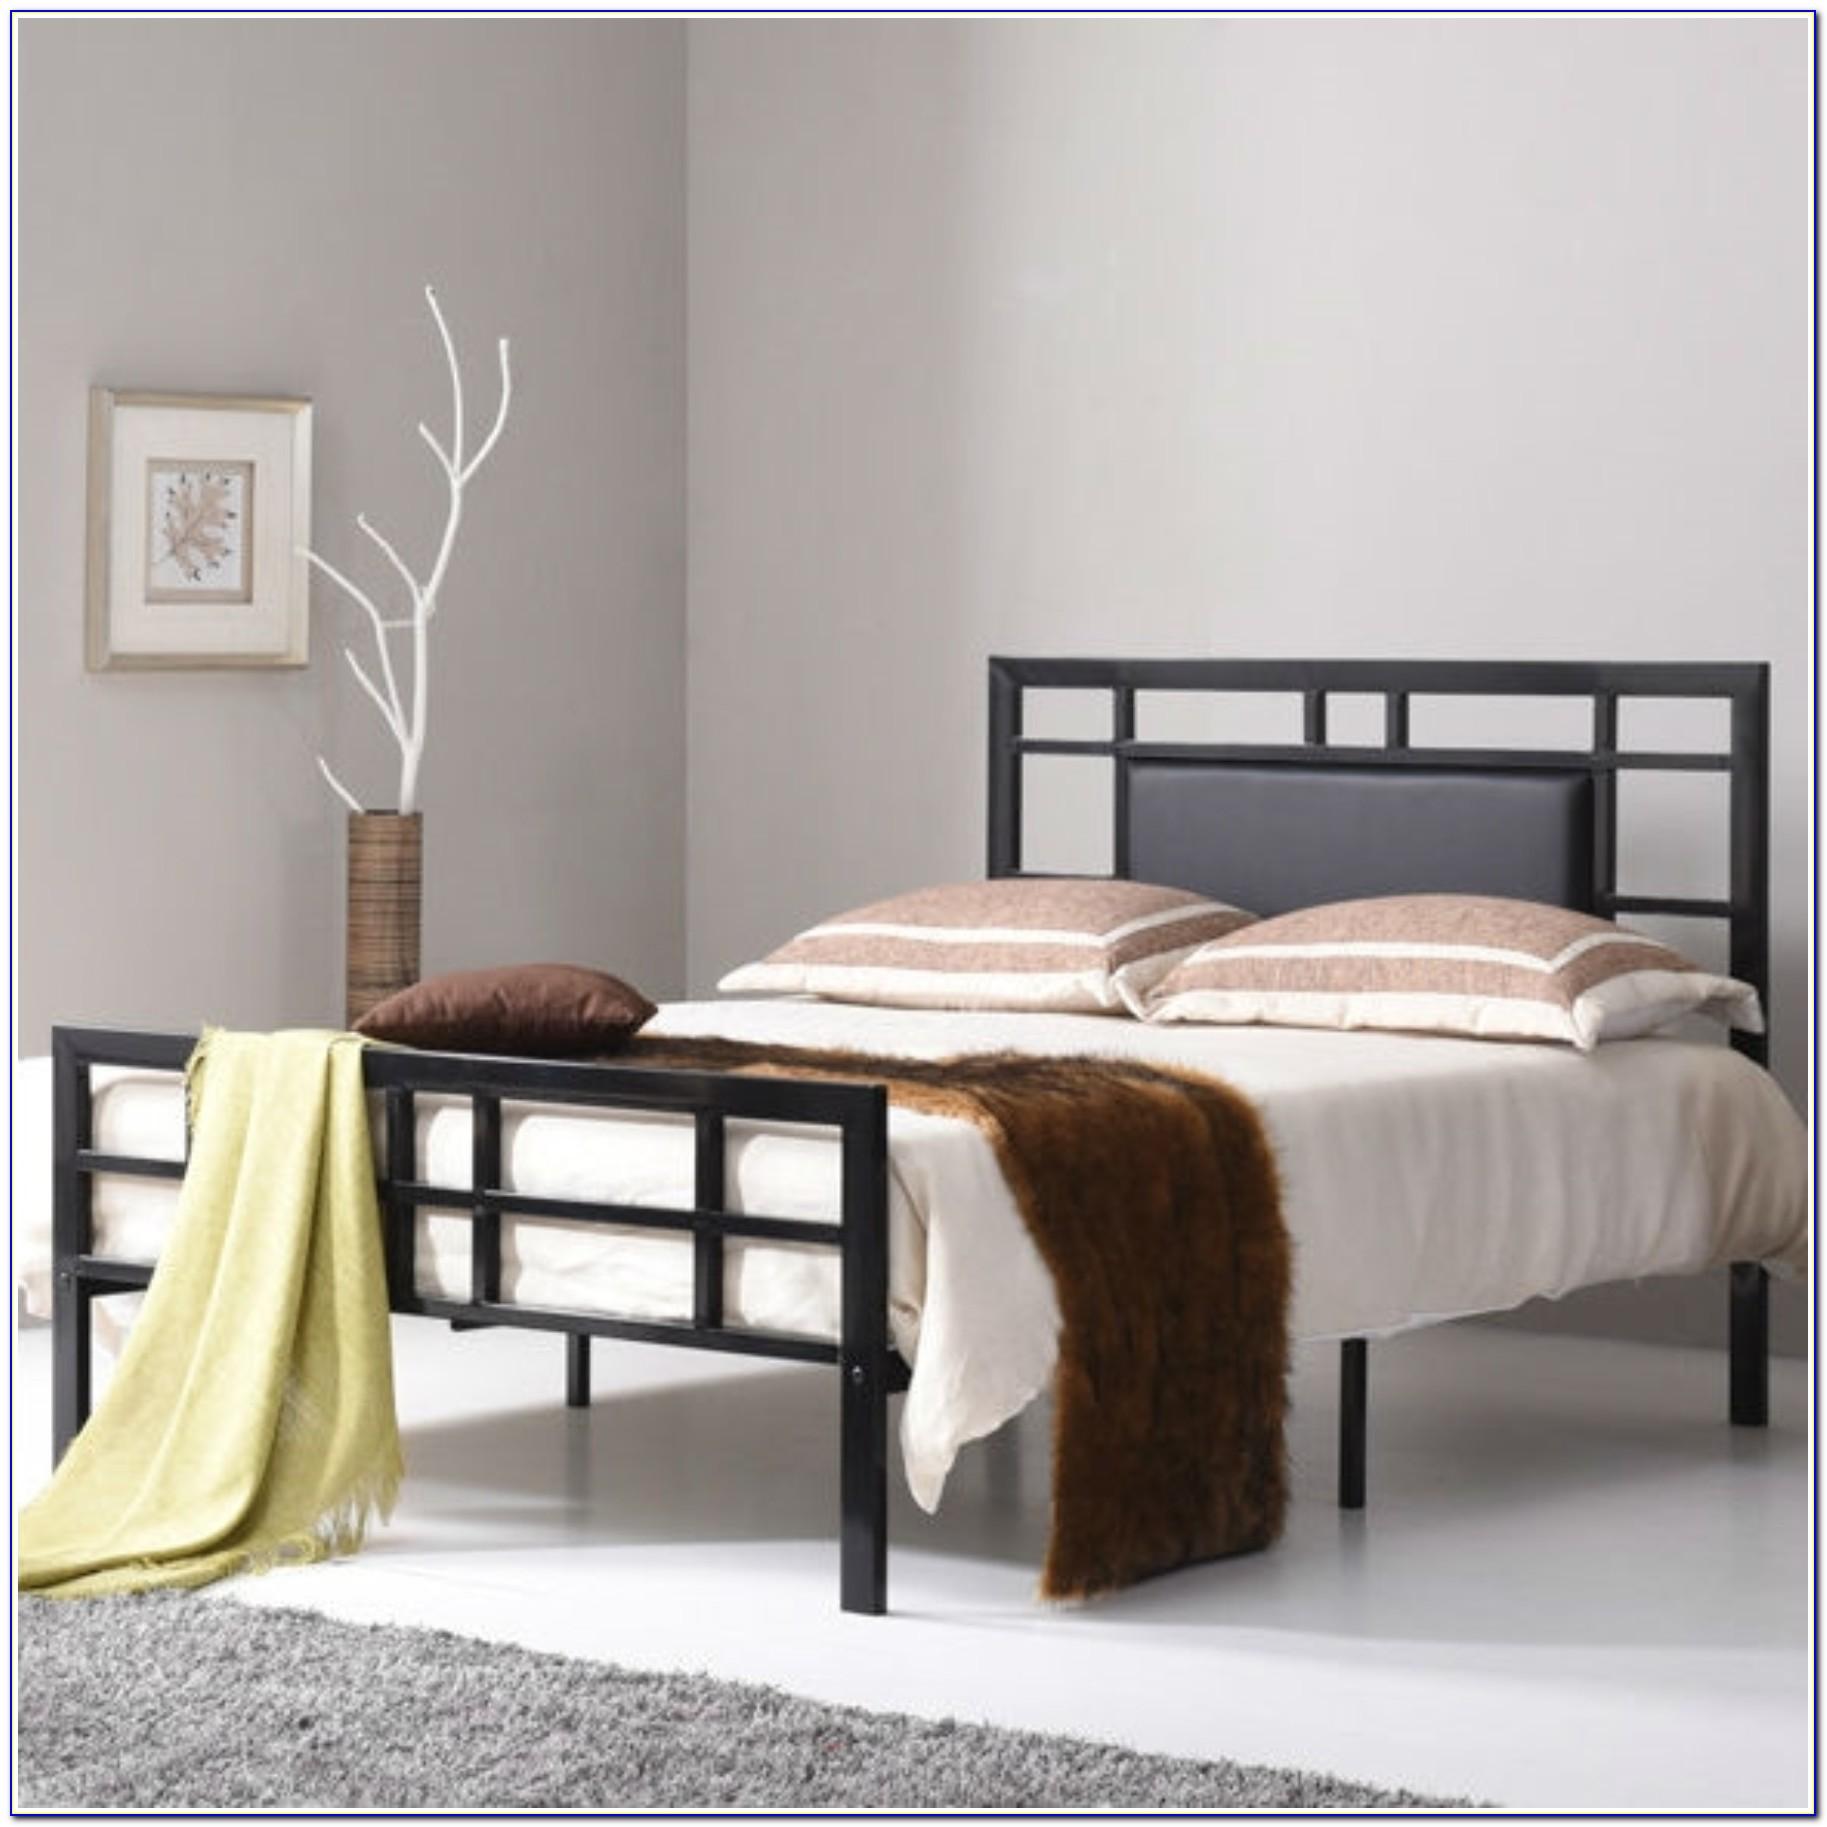 Ikea Metal Bed Frame And Headboard